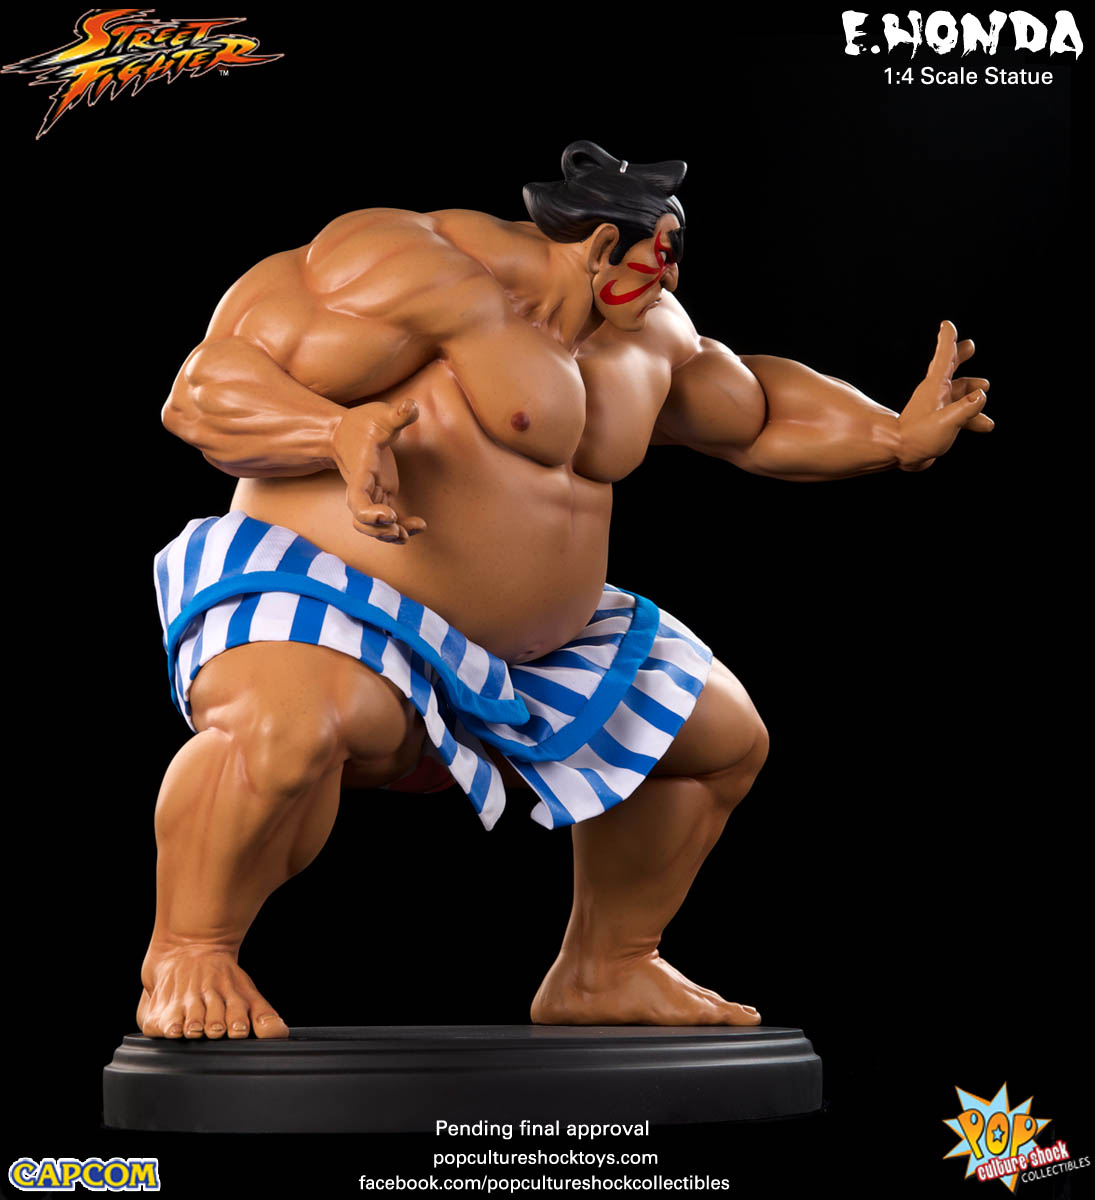 [Pop Culture Shock] Street Fighter: E. Honda 1/4 Statue - Página 3 Street-Fighter-E.-Honda-Regular-Statue-012